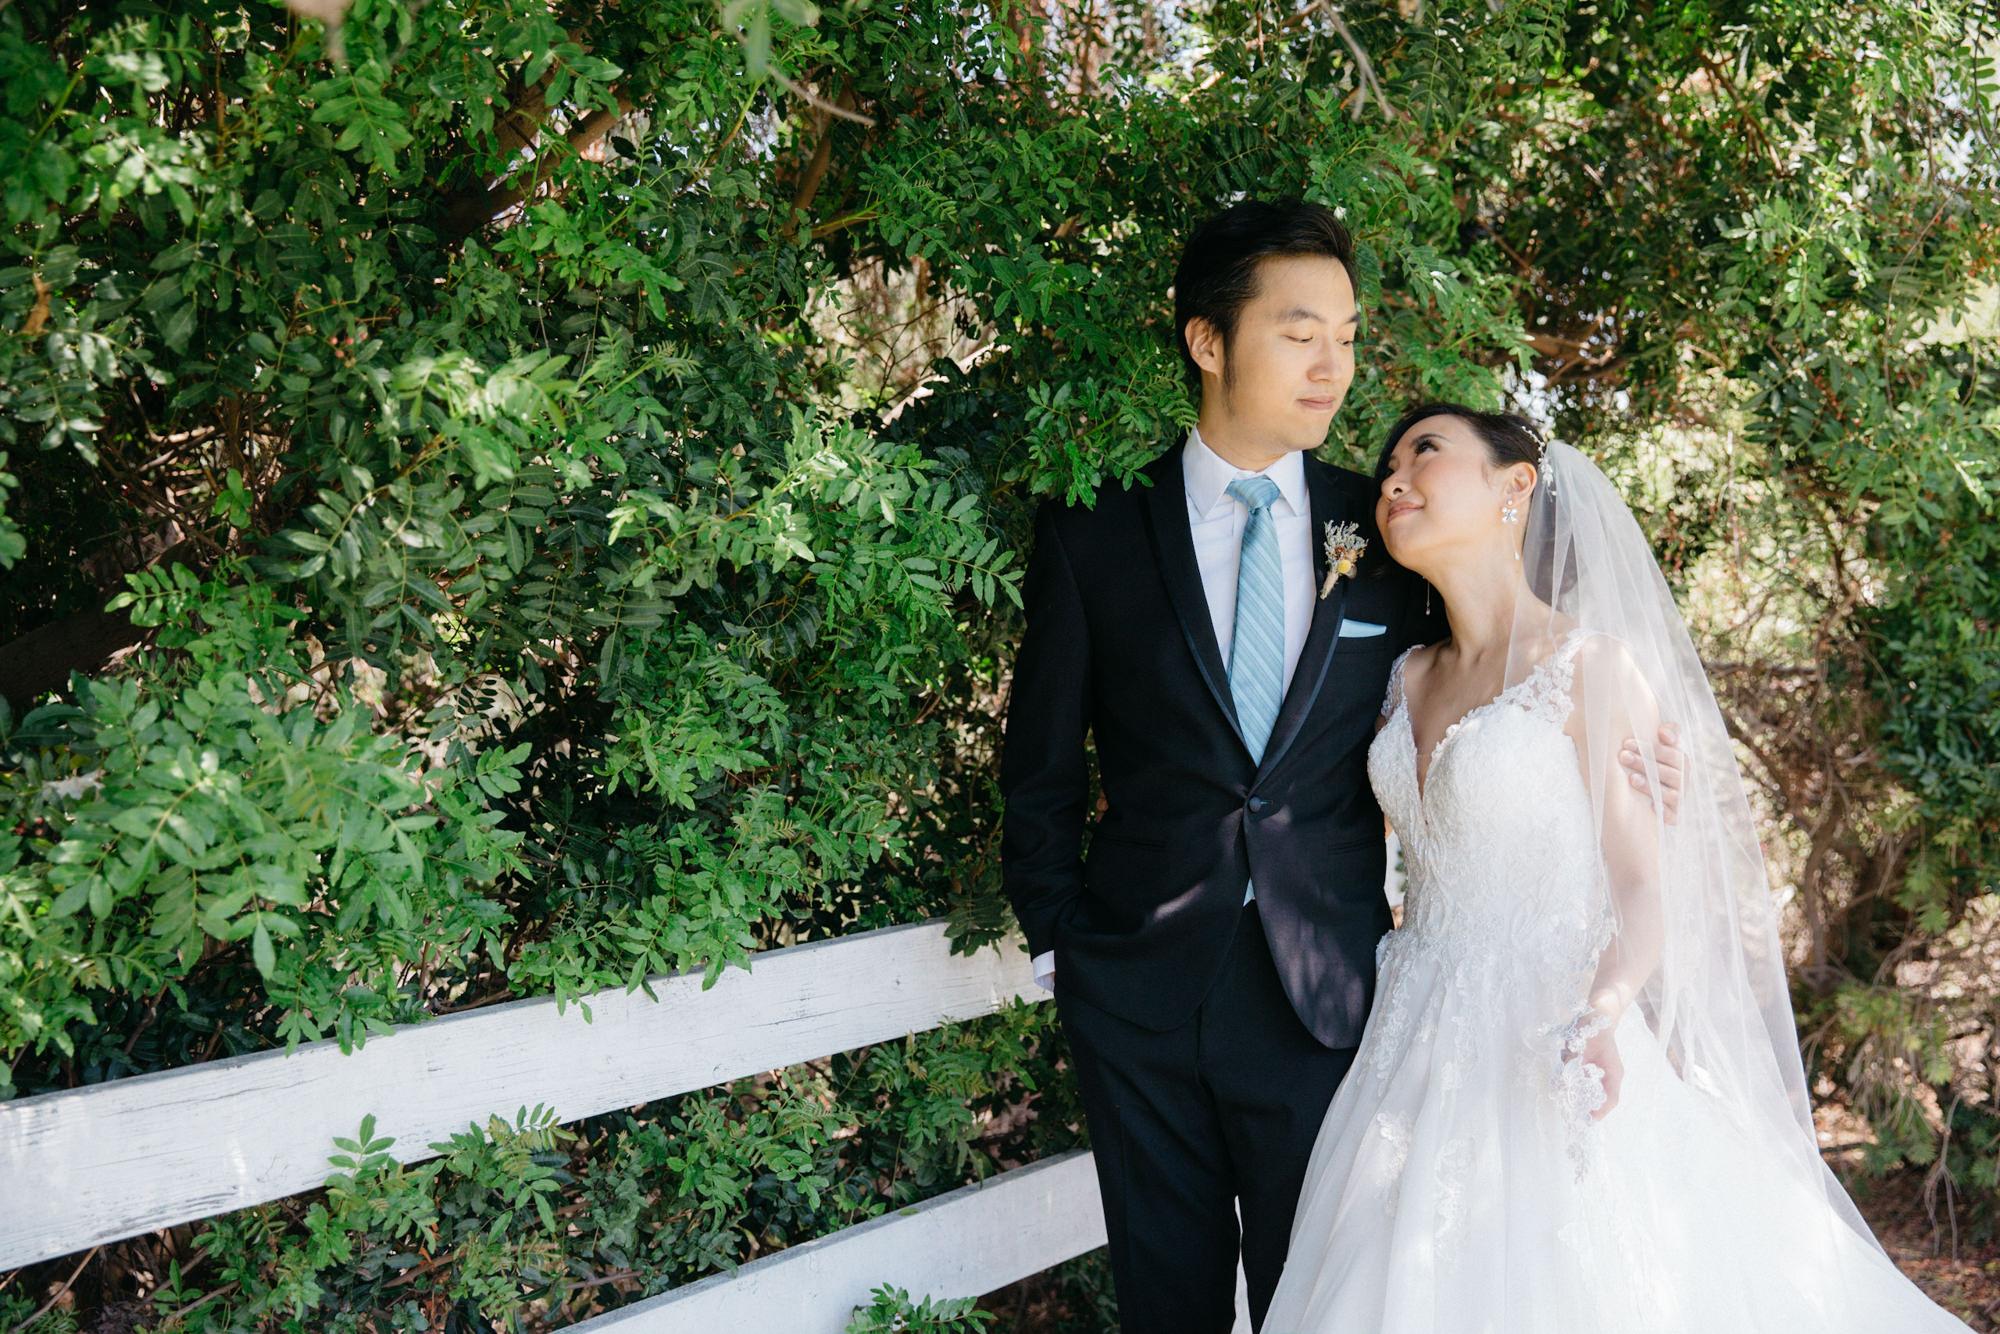 Tian and Cherry by Jenna Pangan-7.jpg